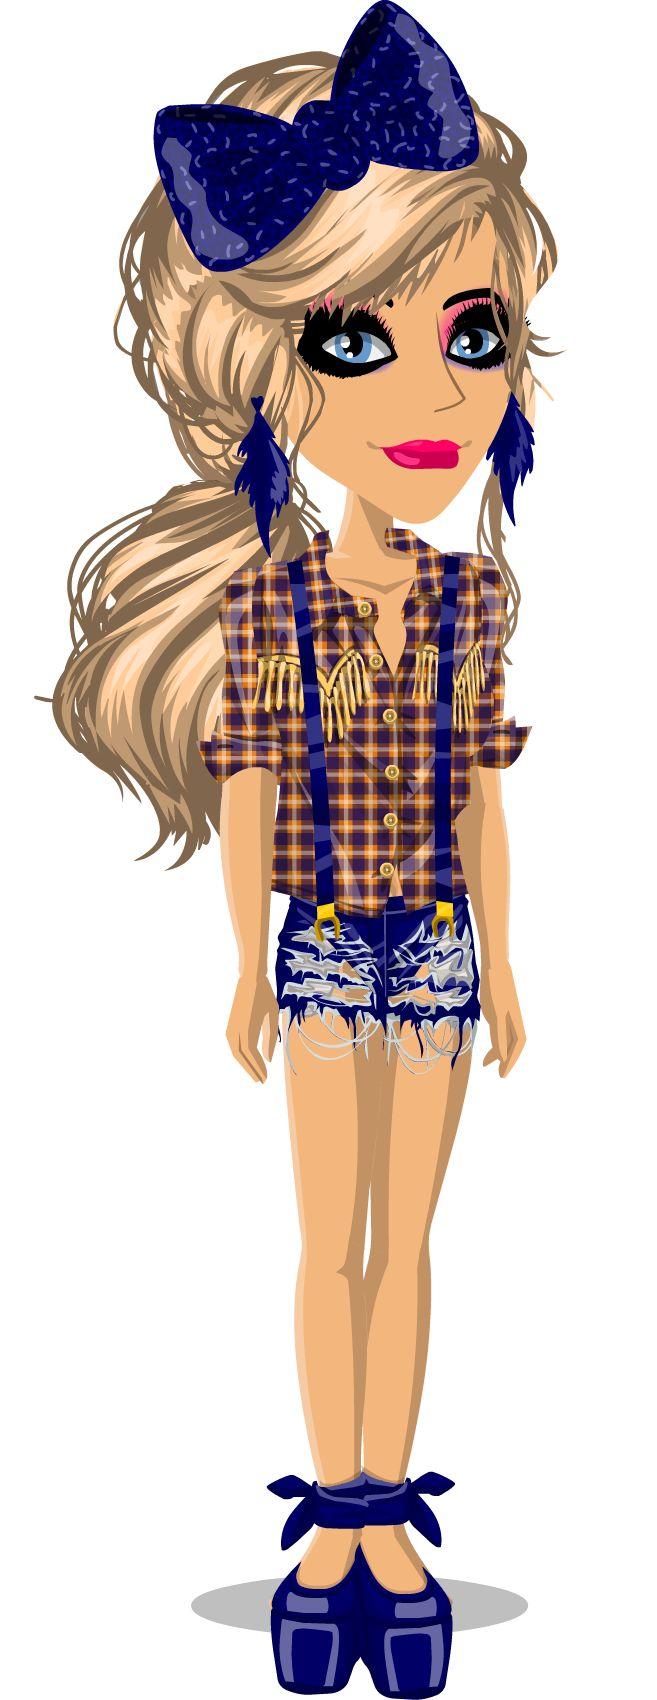 Cute look, kinda reminds me of a cute farm girlll